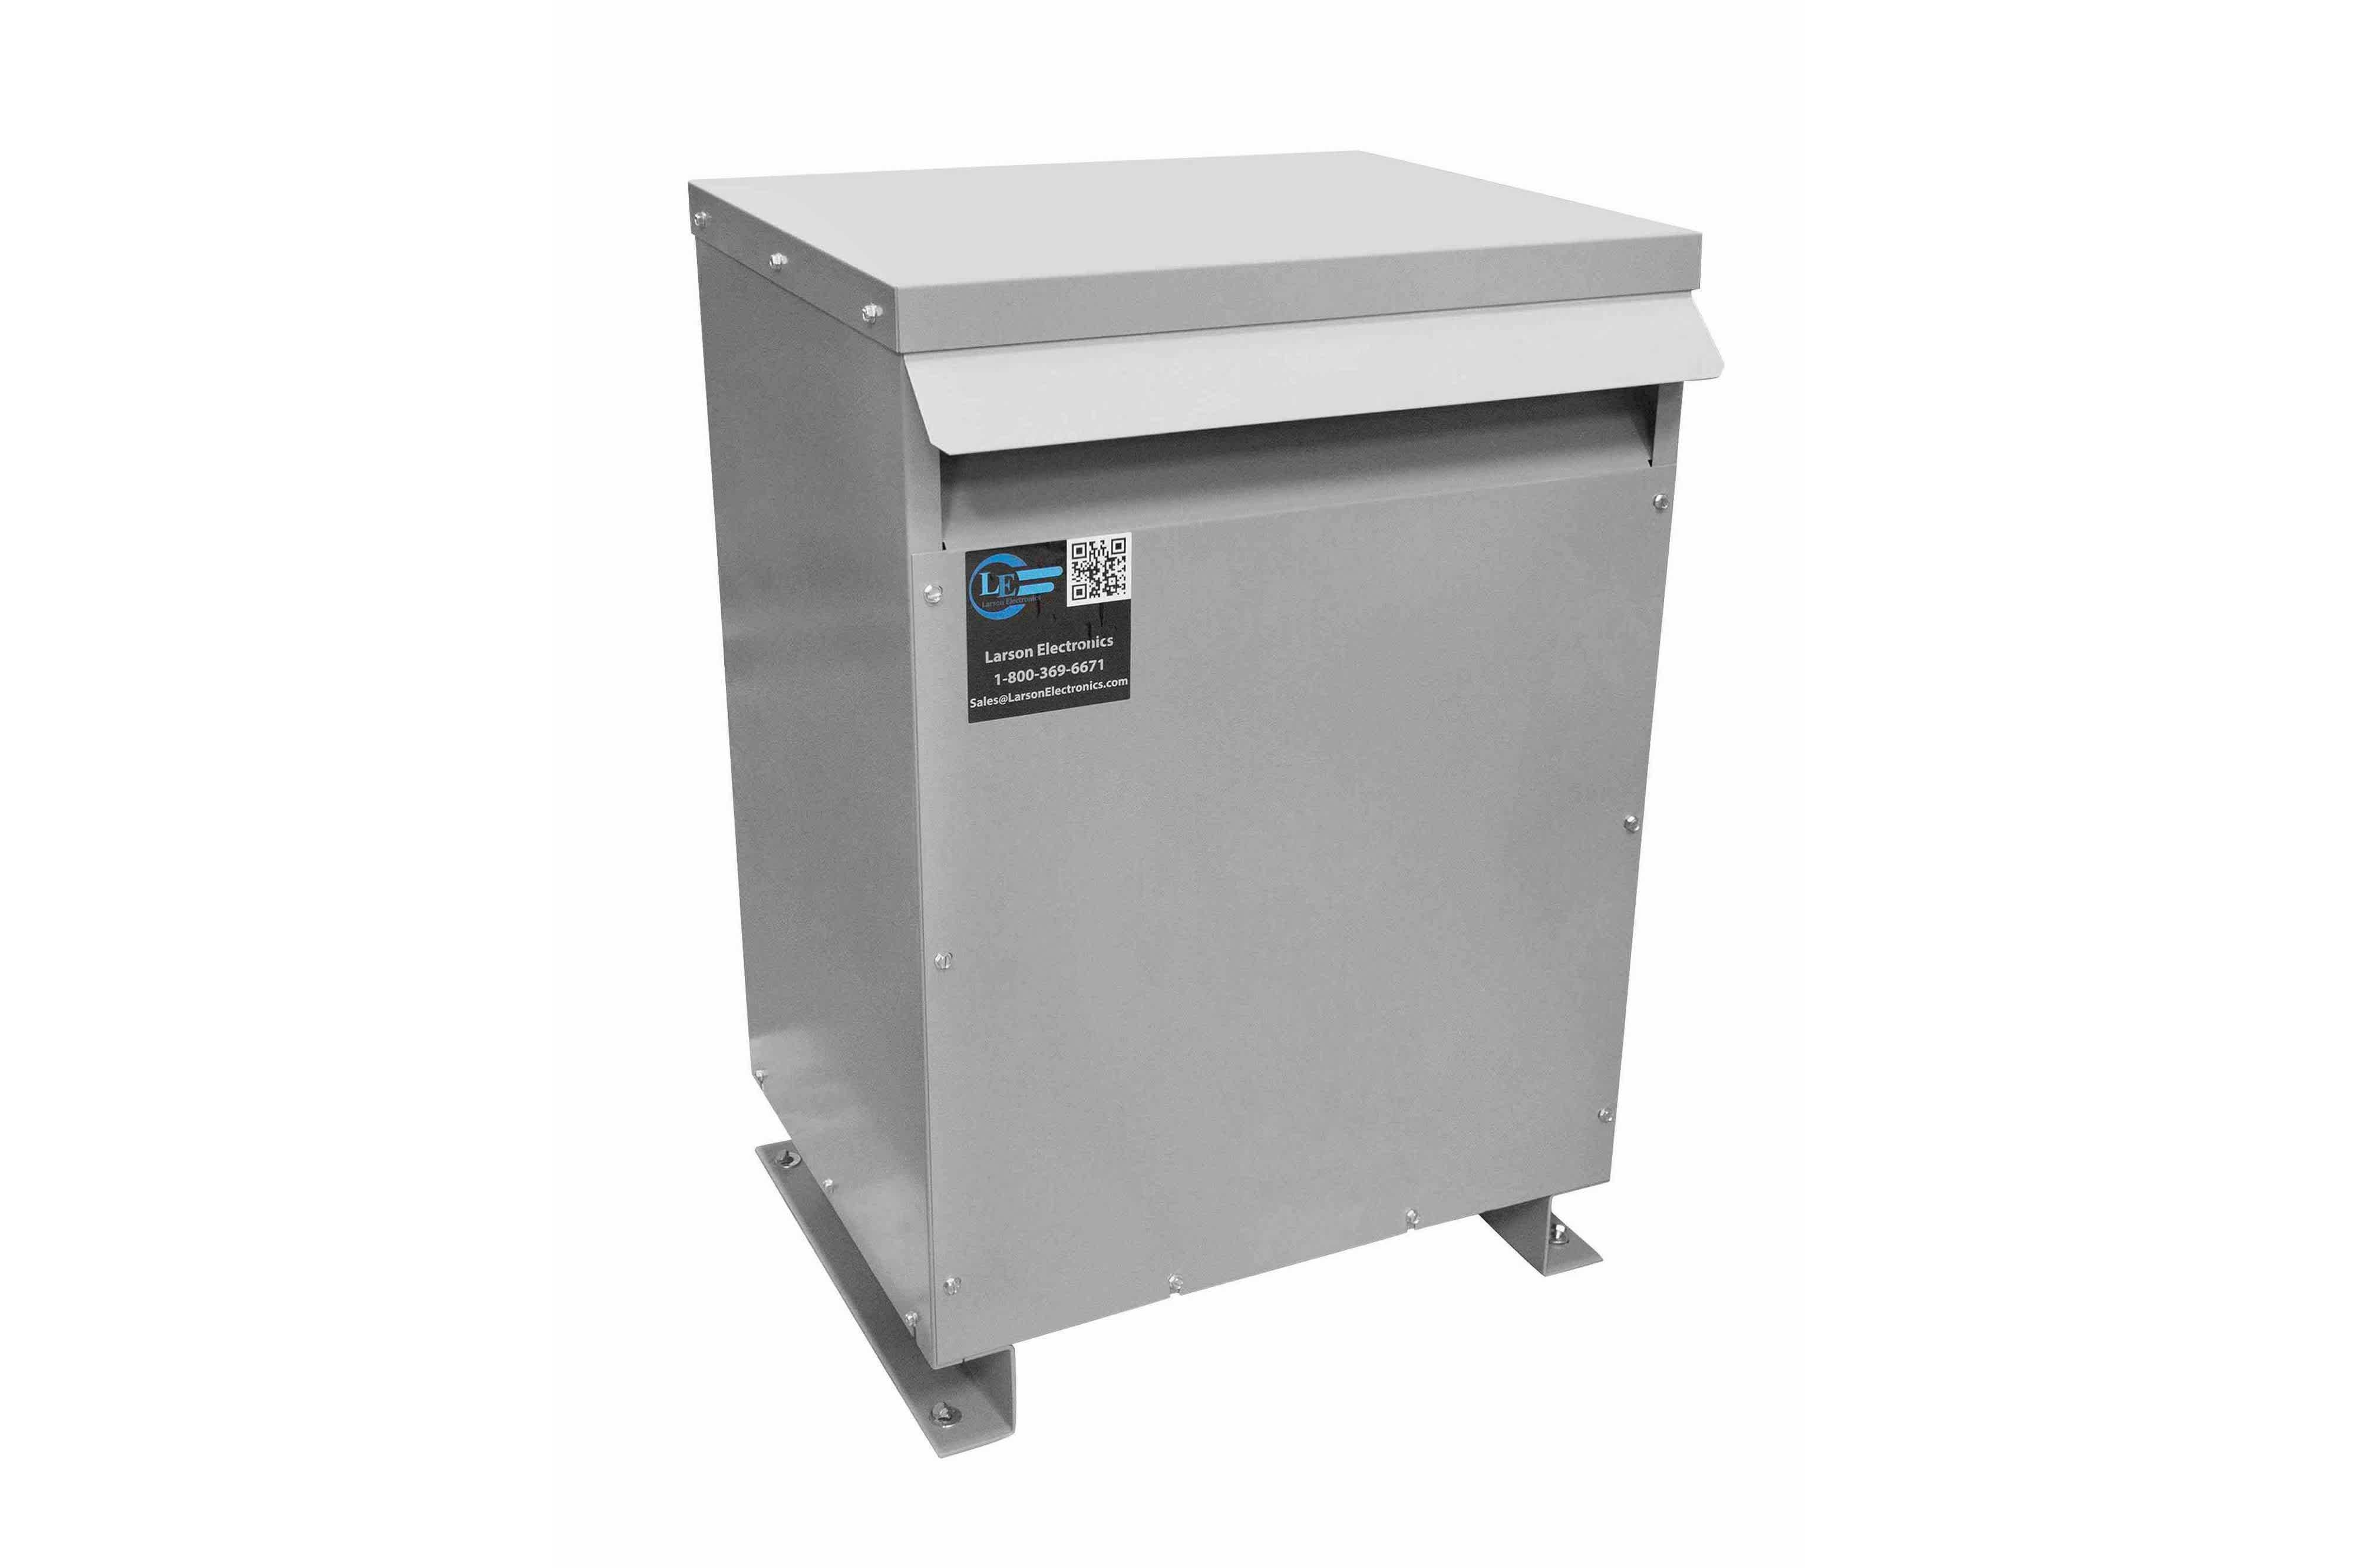 29 kVA 3PH Isolation Transformer, 600V Wye Primary, 400V Delta Secondary, N3R, Ventilated, 60 Hz